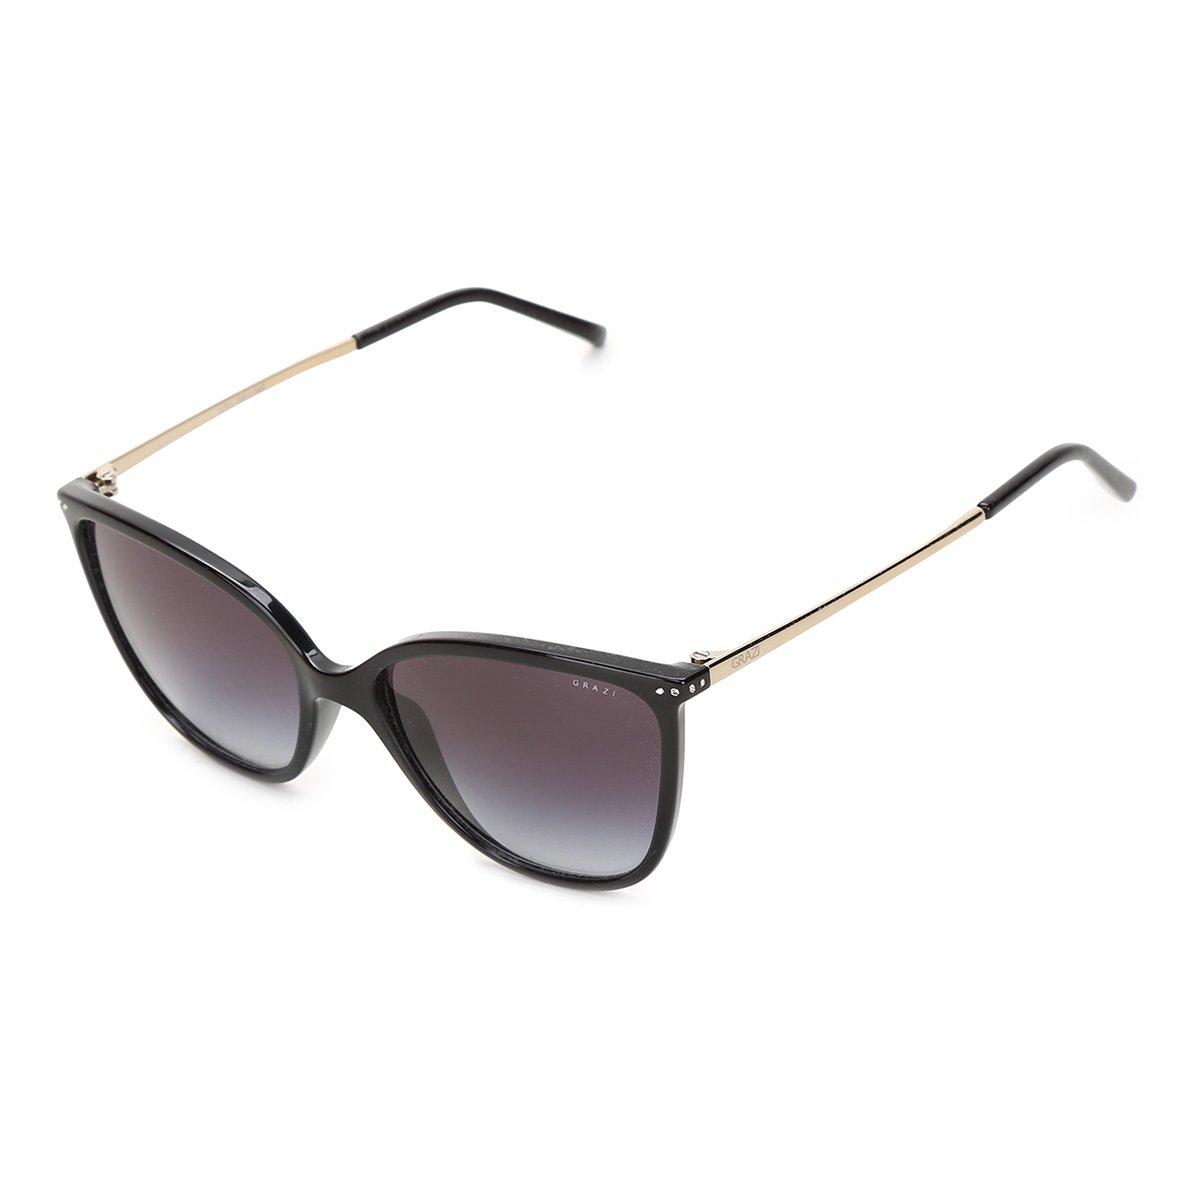 Óculos de Sol Grazi Massafera 0GZ4033B Feminino